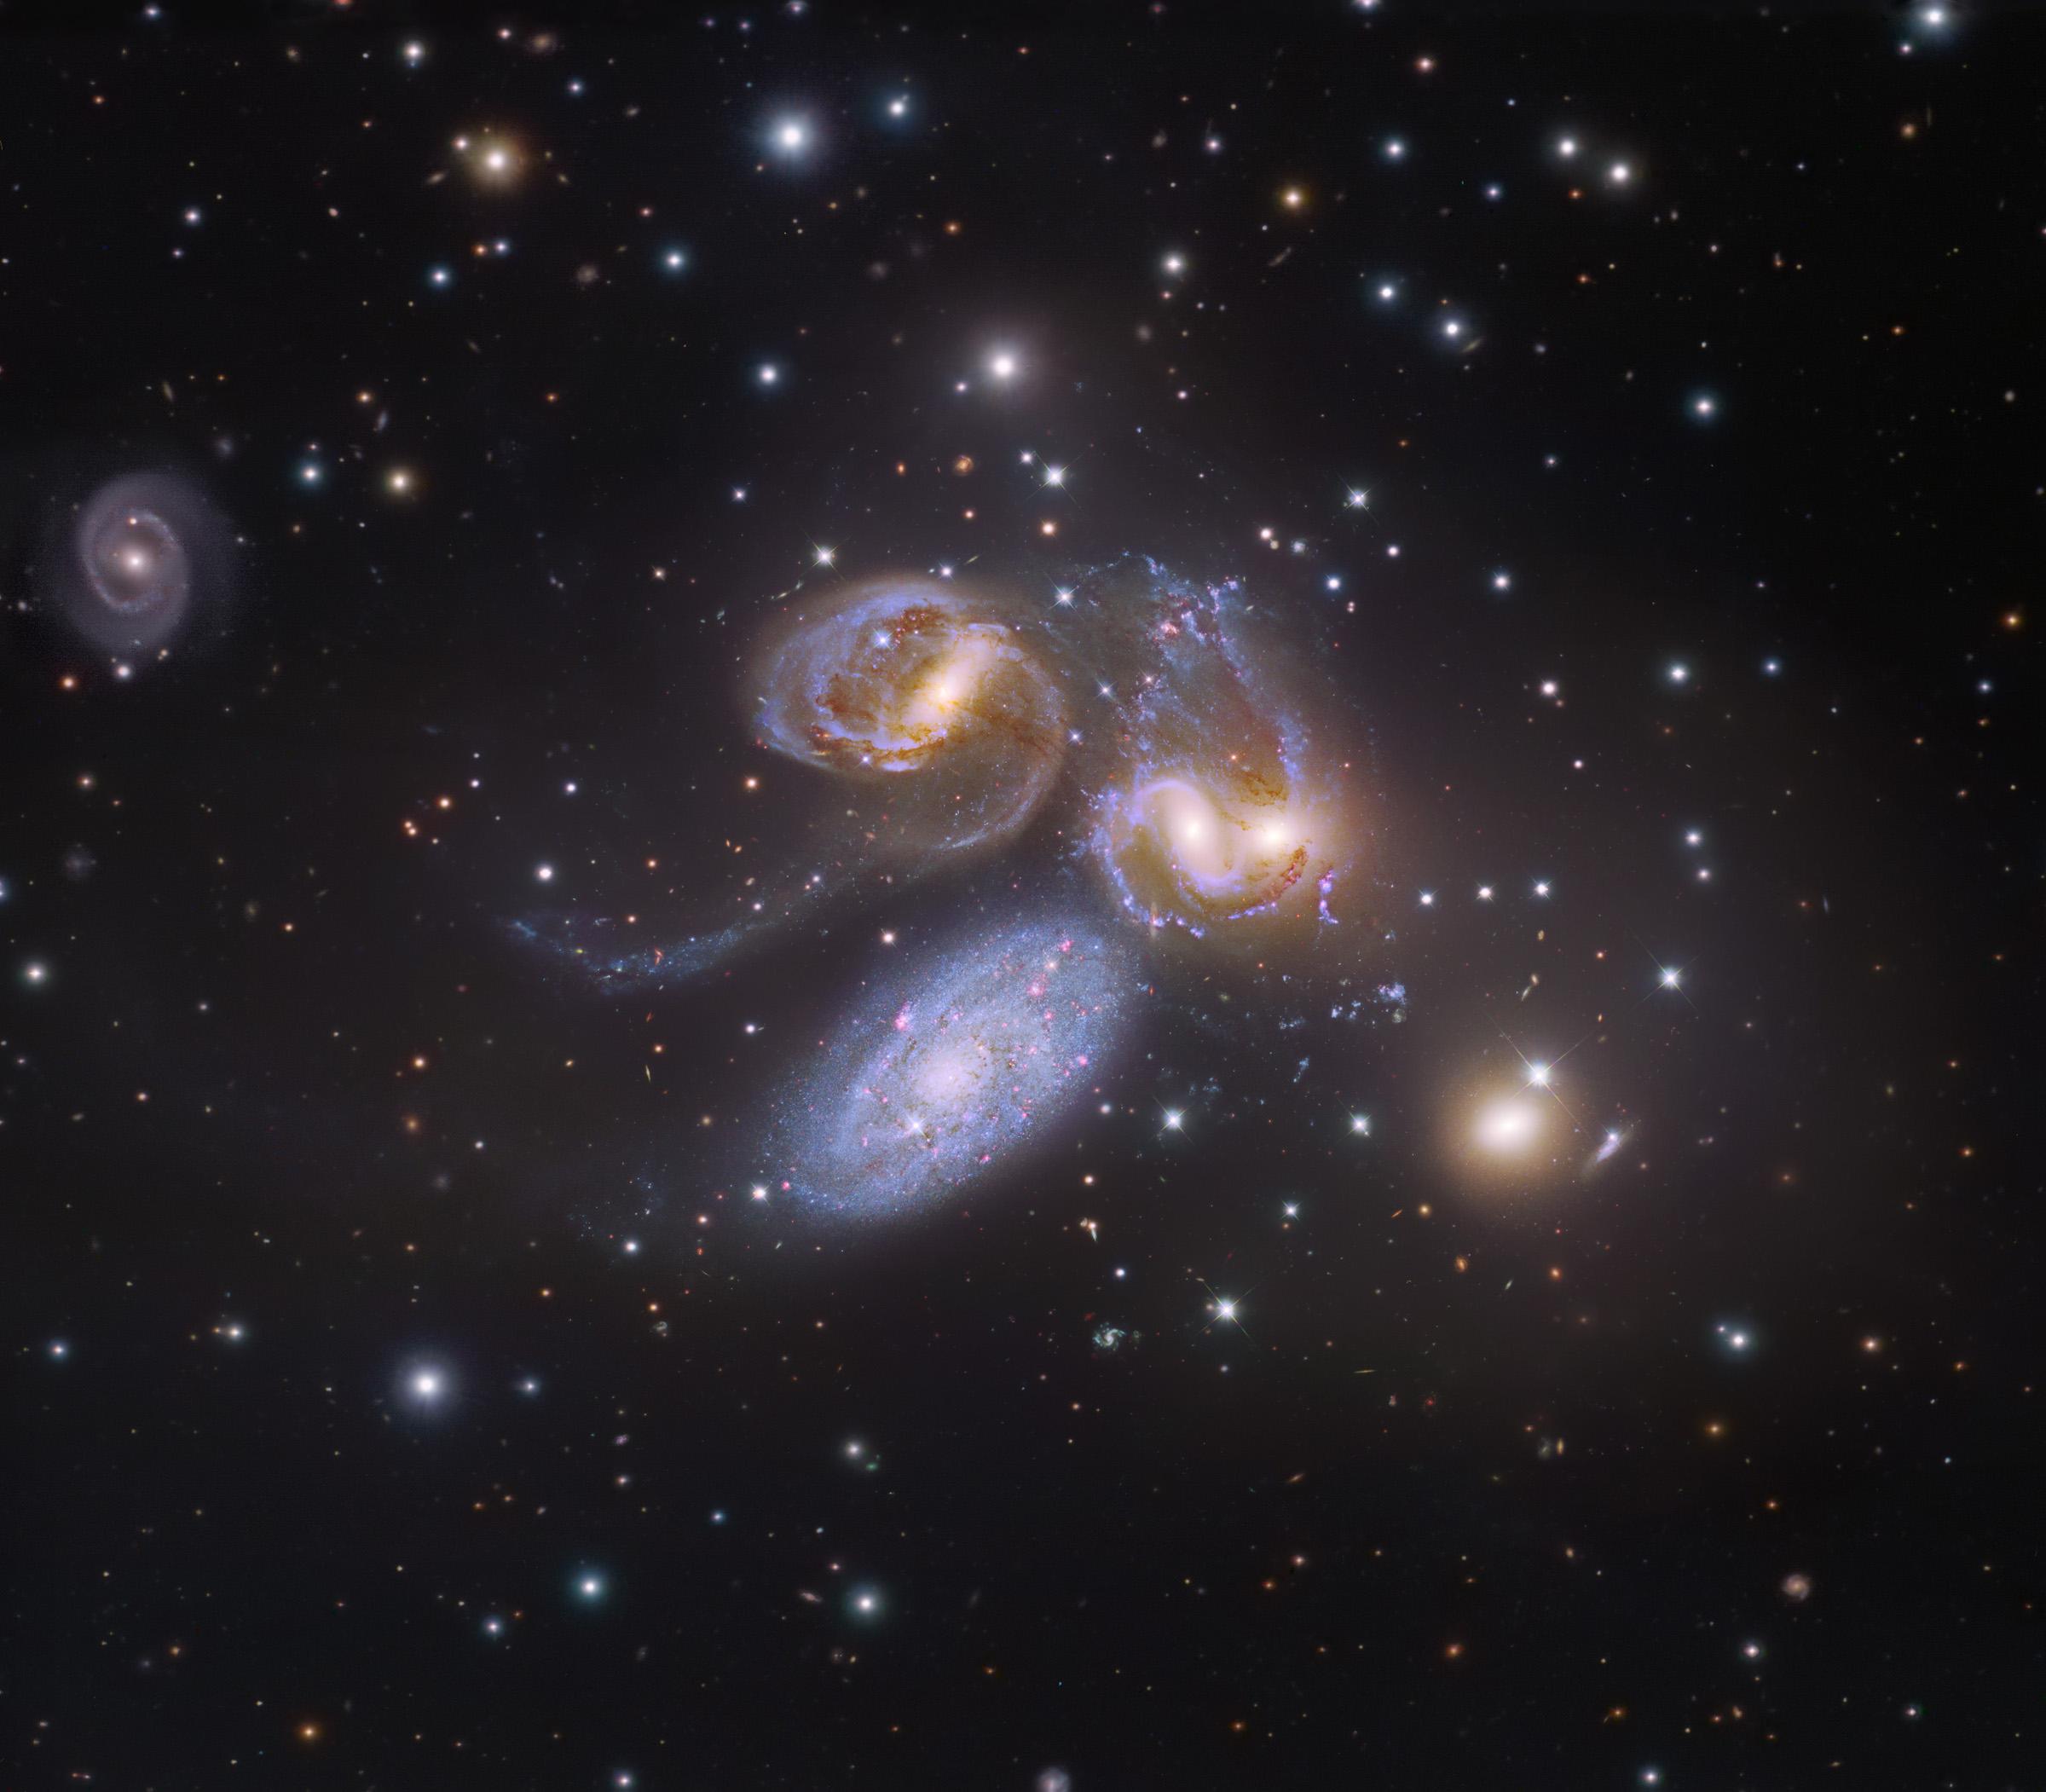 Apod 2014 March 27 Stephan S Quintet Plus One